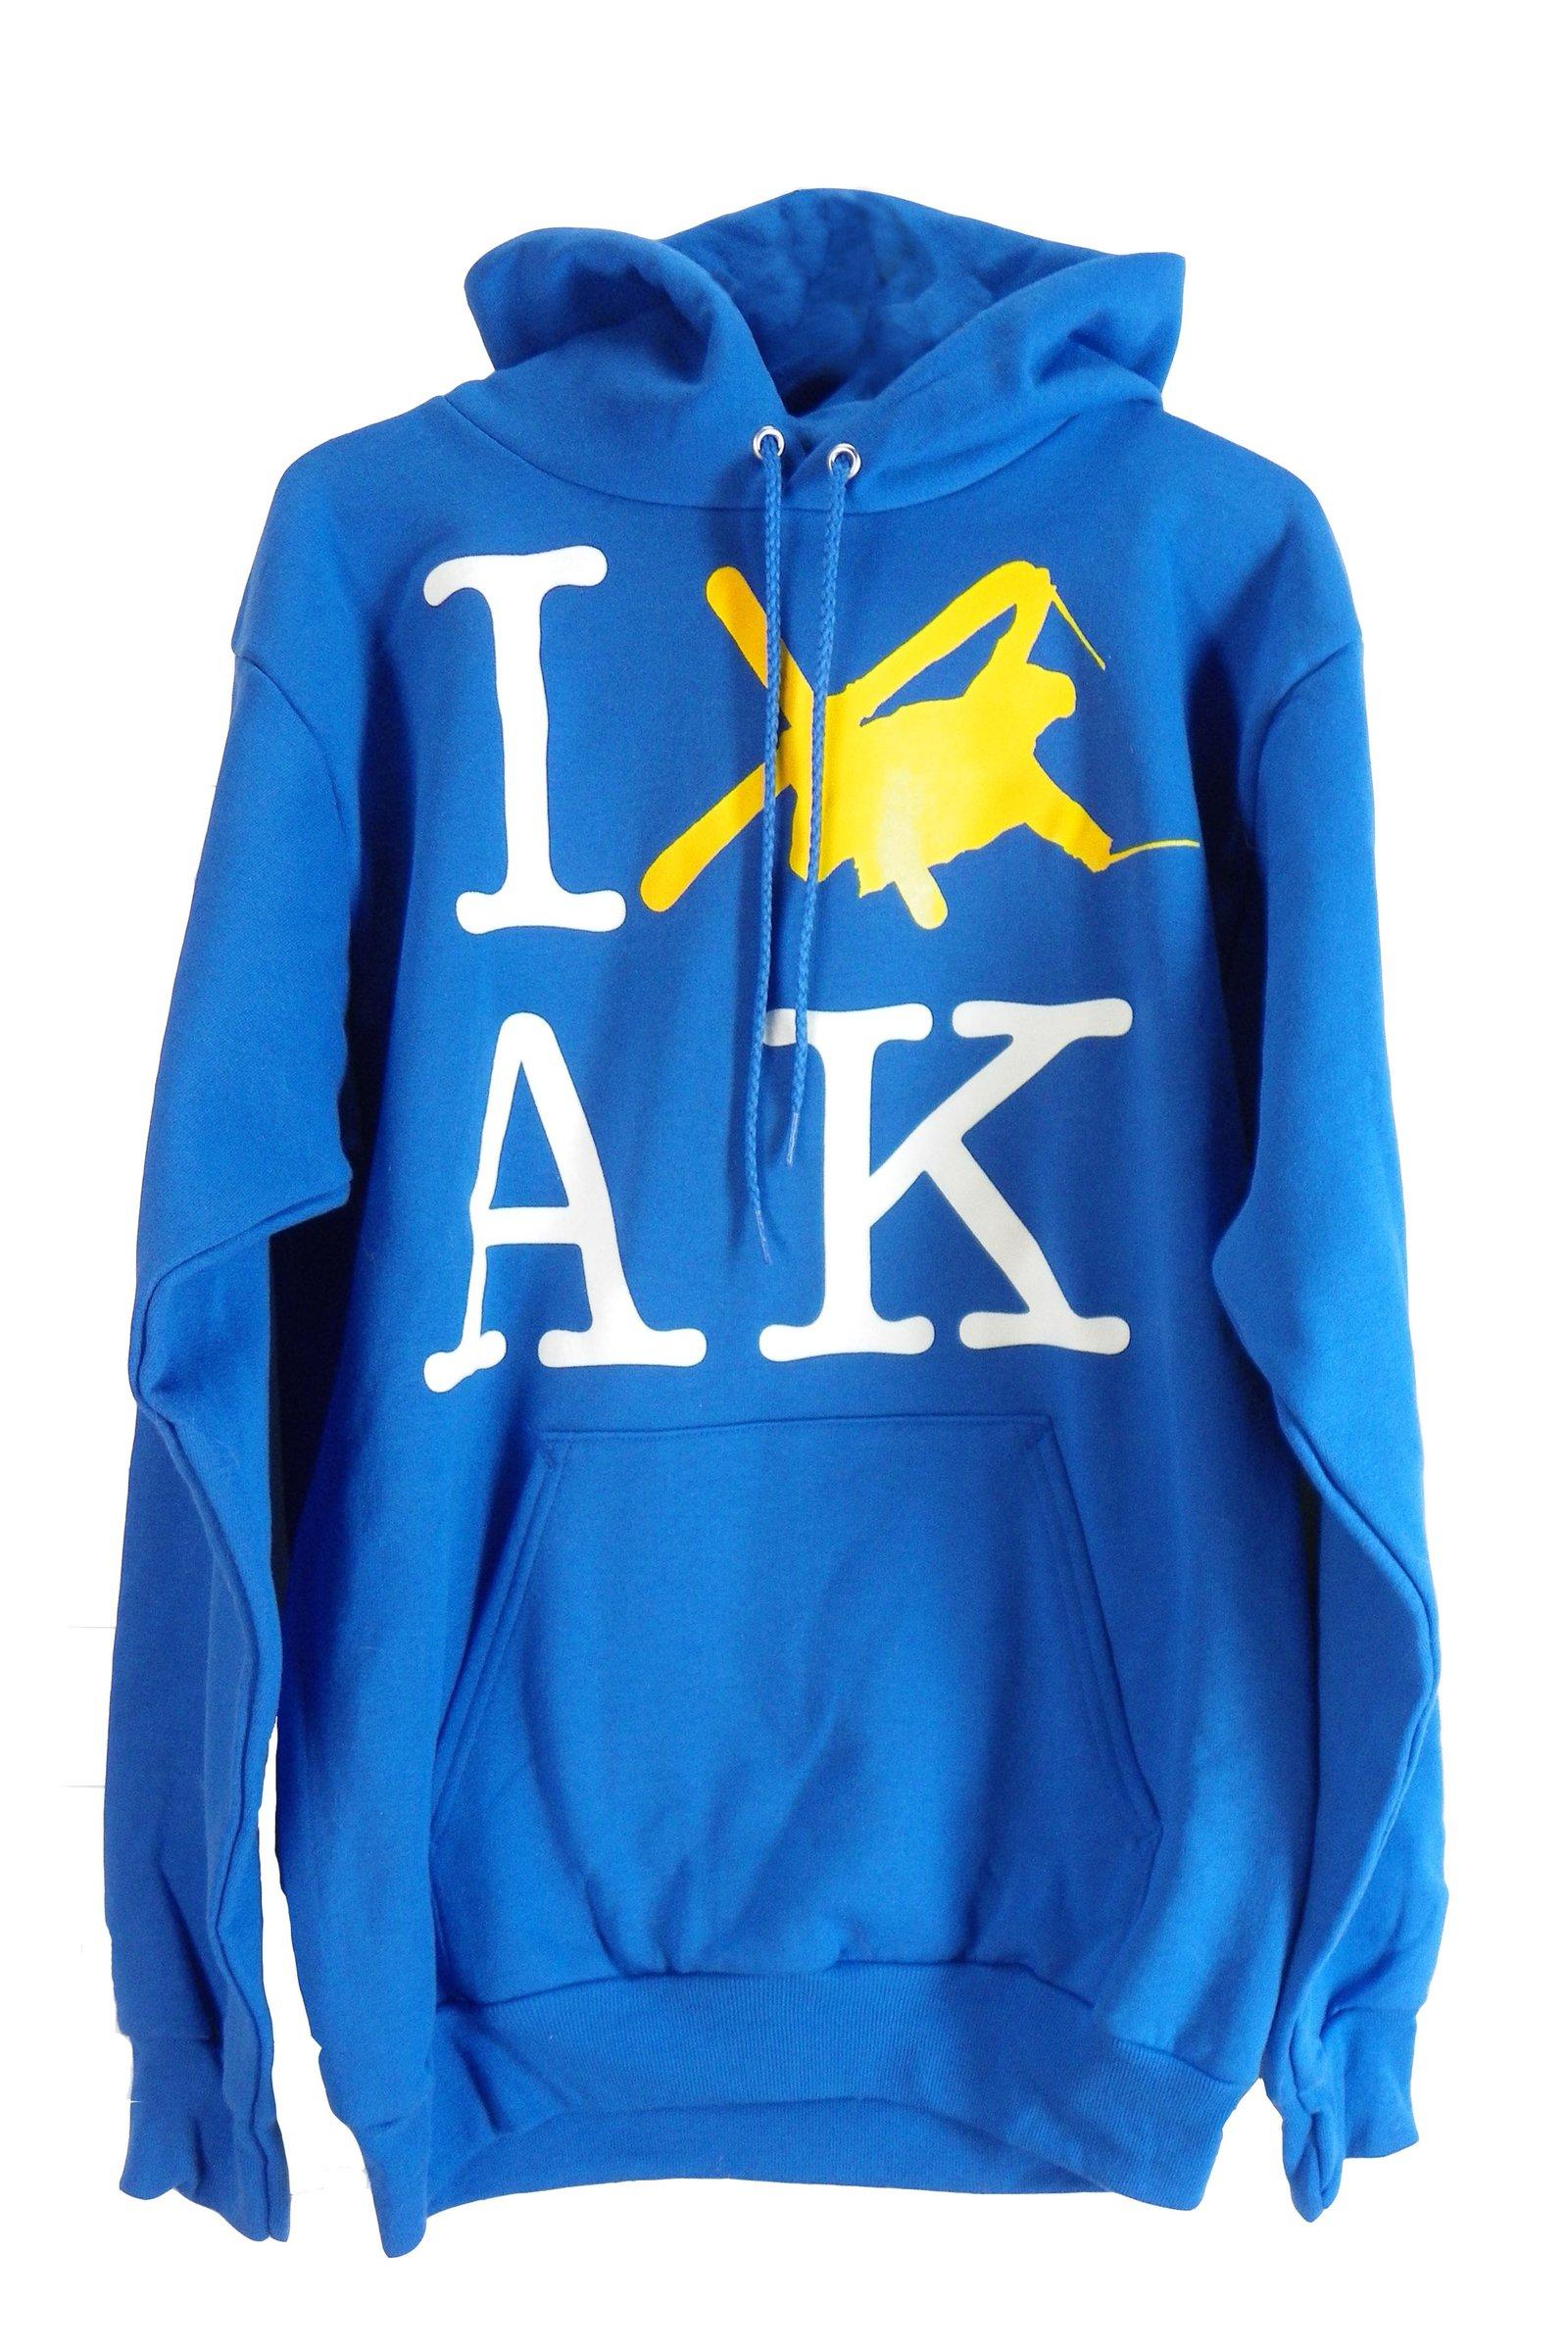 I SKI AK Blue Hoodie